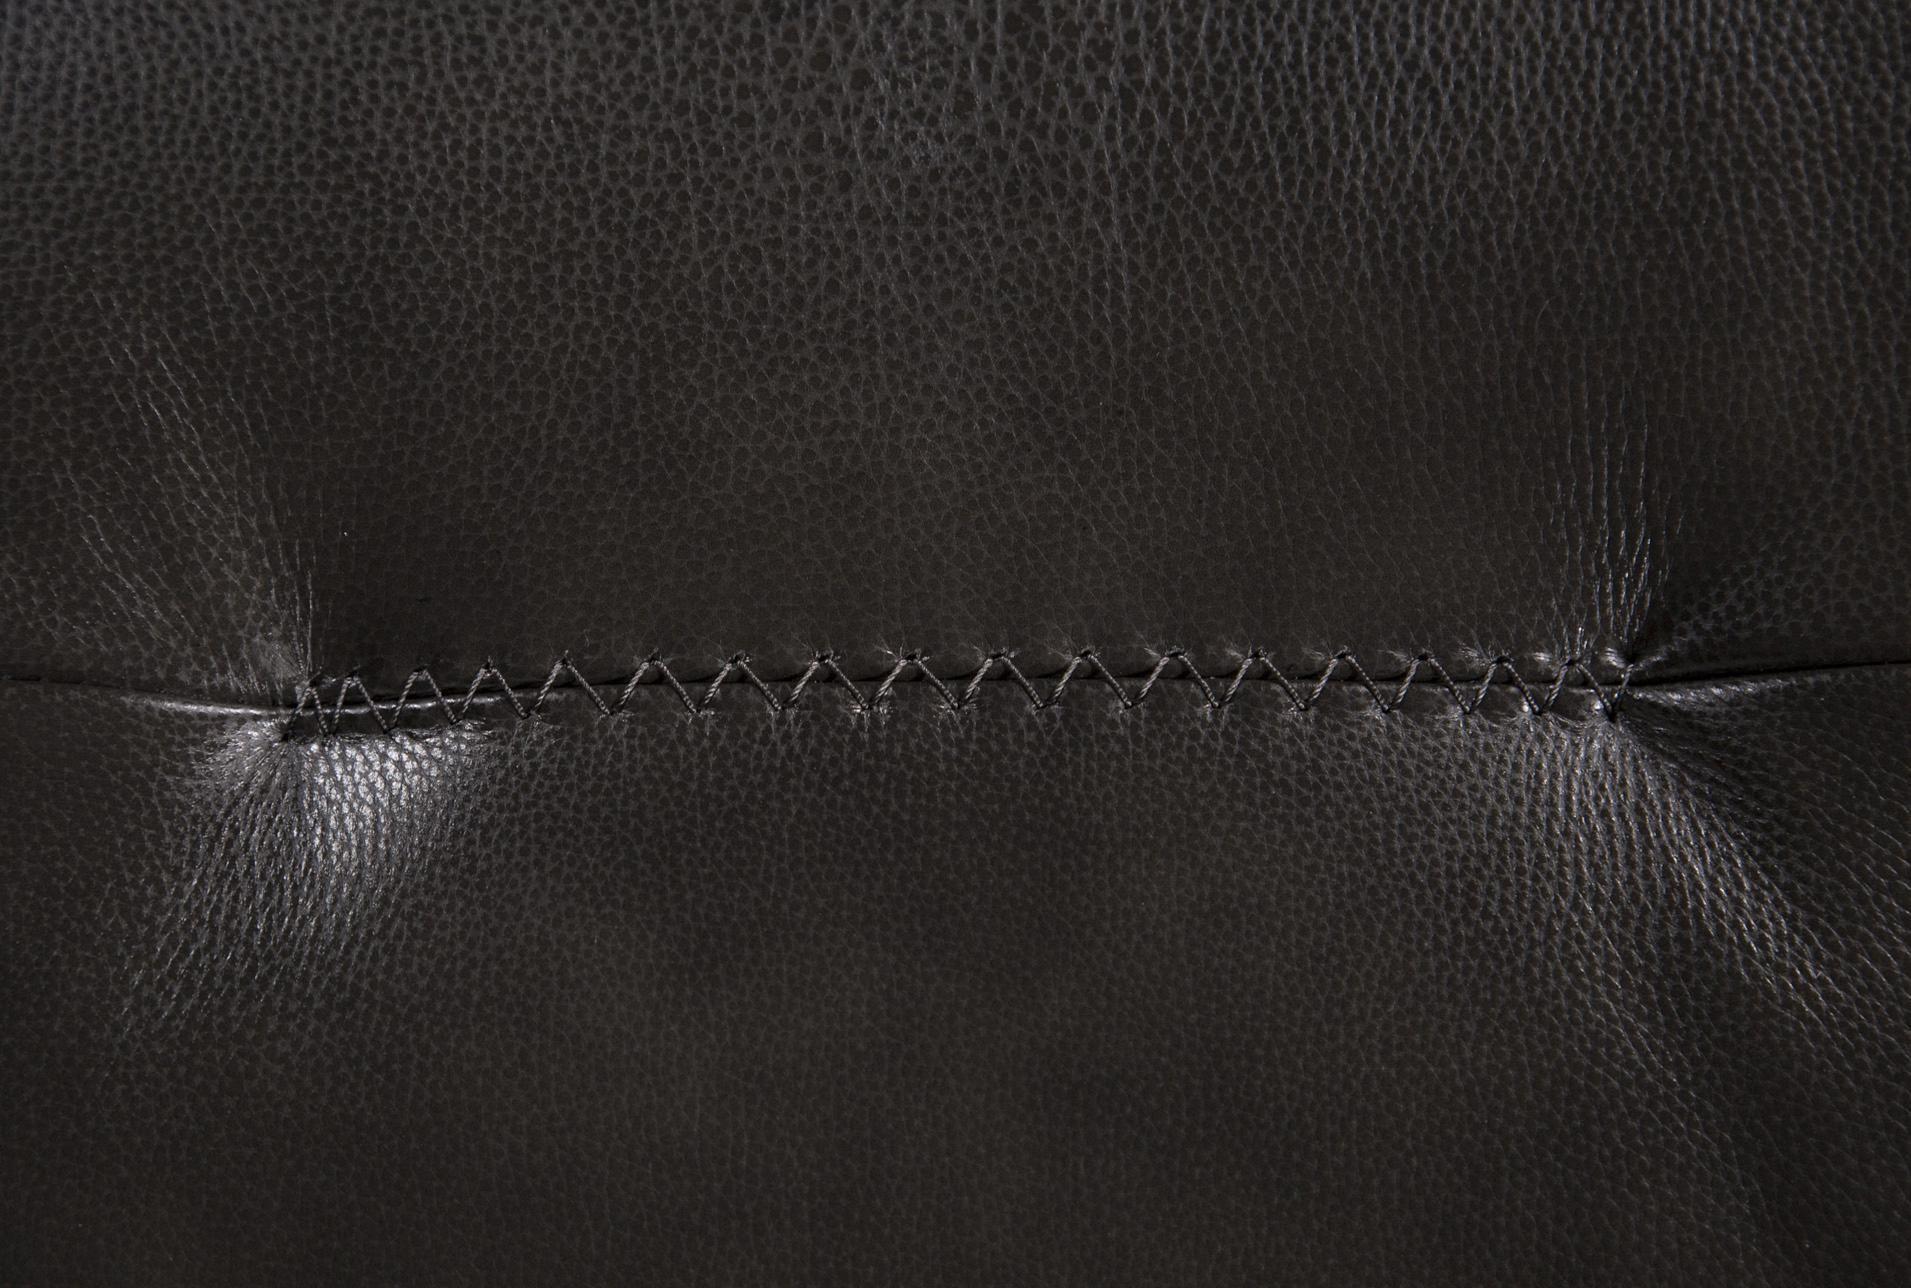 Amala Dark Grey Leather Reclining Swivel Chair #swivelreclinerchairs Regarding Amala White Leather Reclining Swivel Chairs (View 10 of 25)